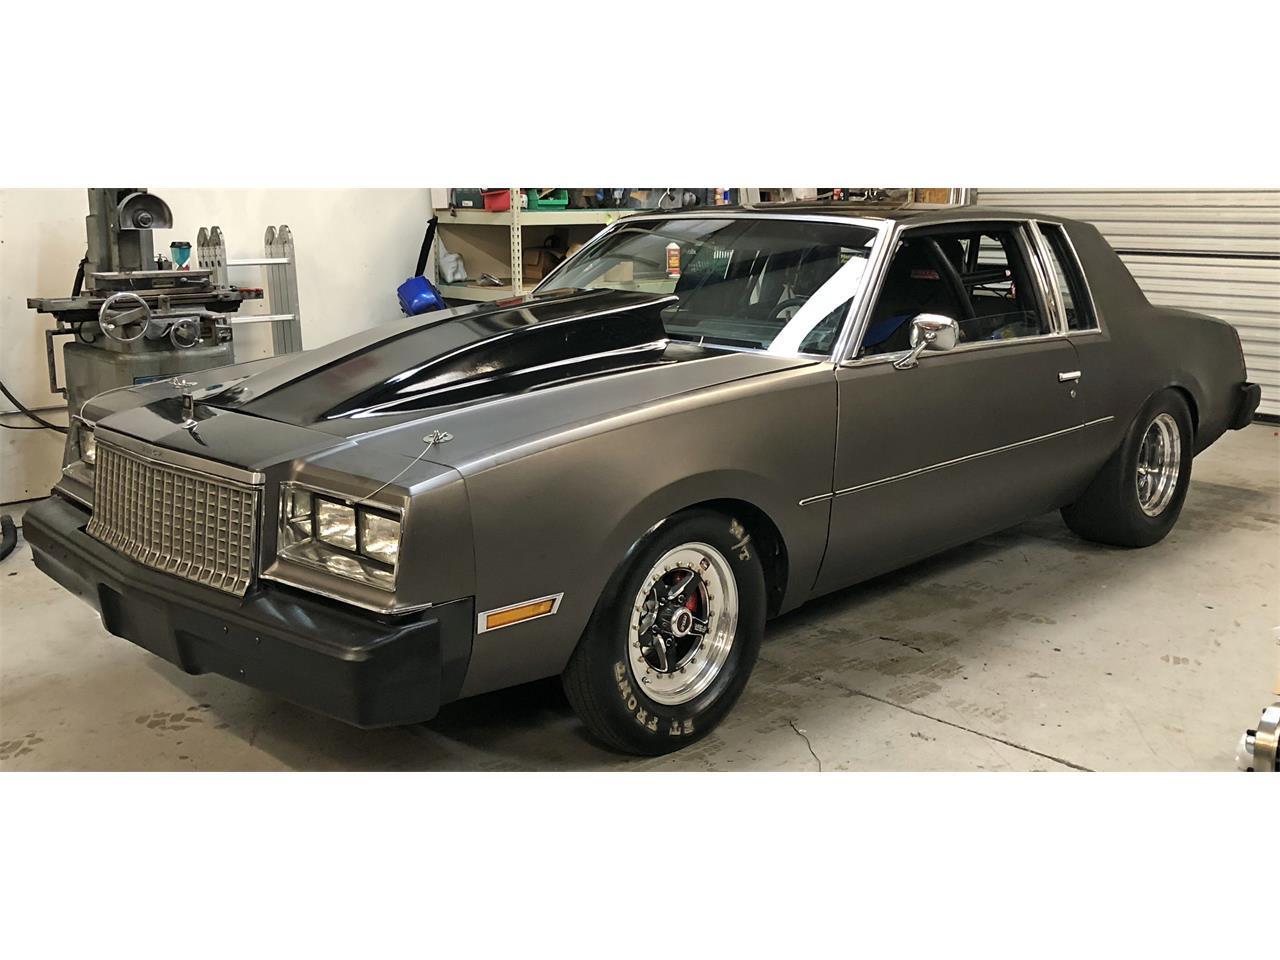 1980 buick regal for sale | classiccars | cc-1075717